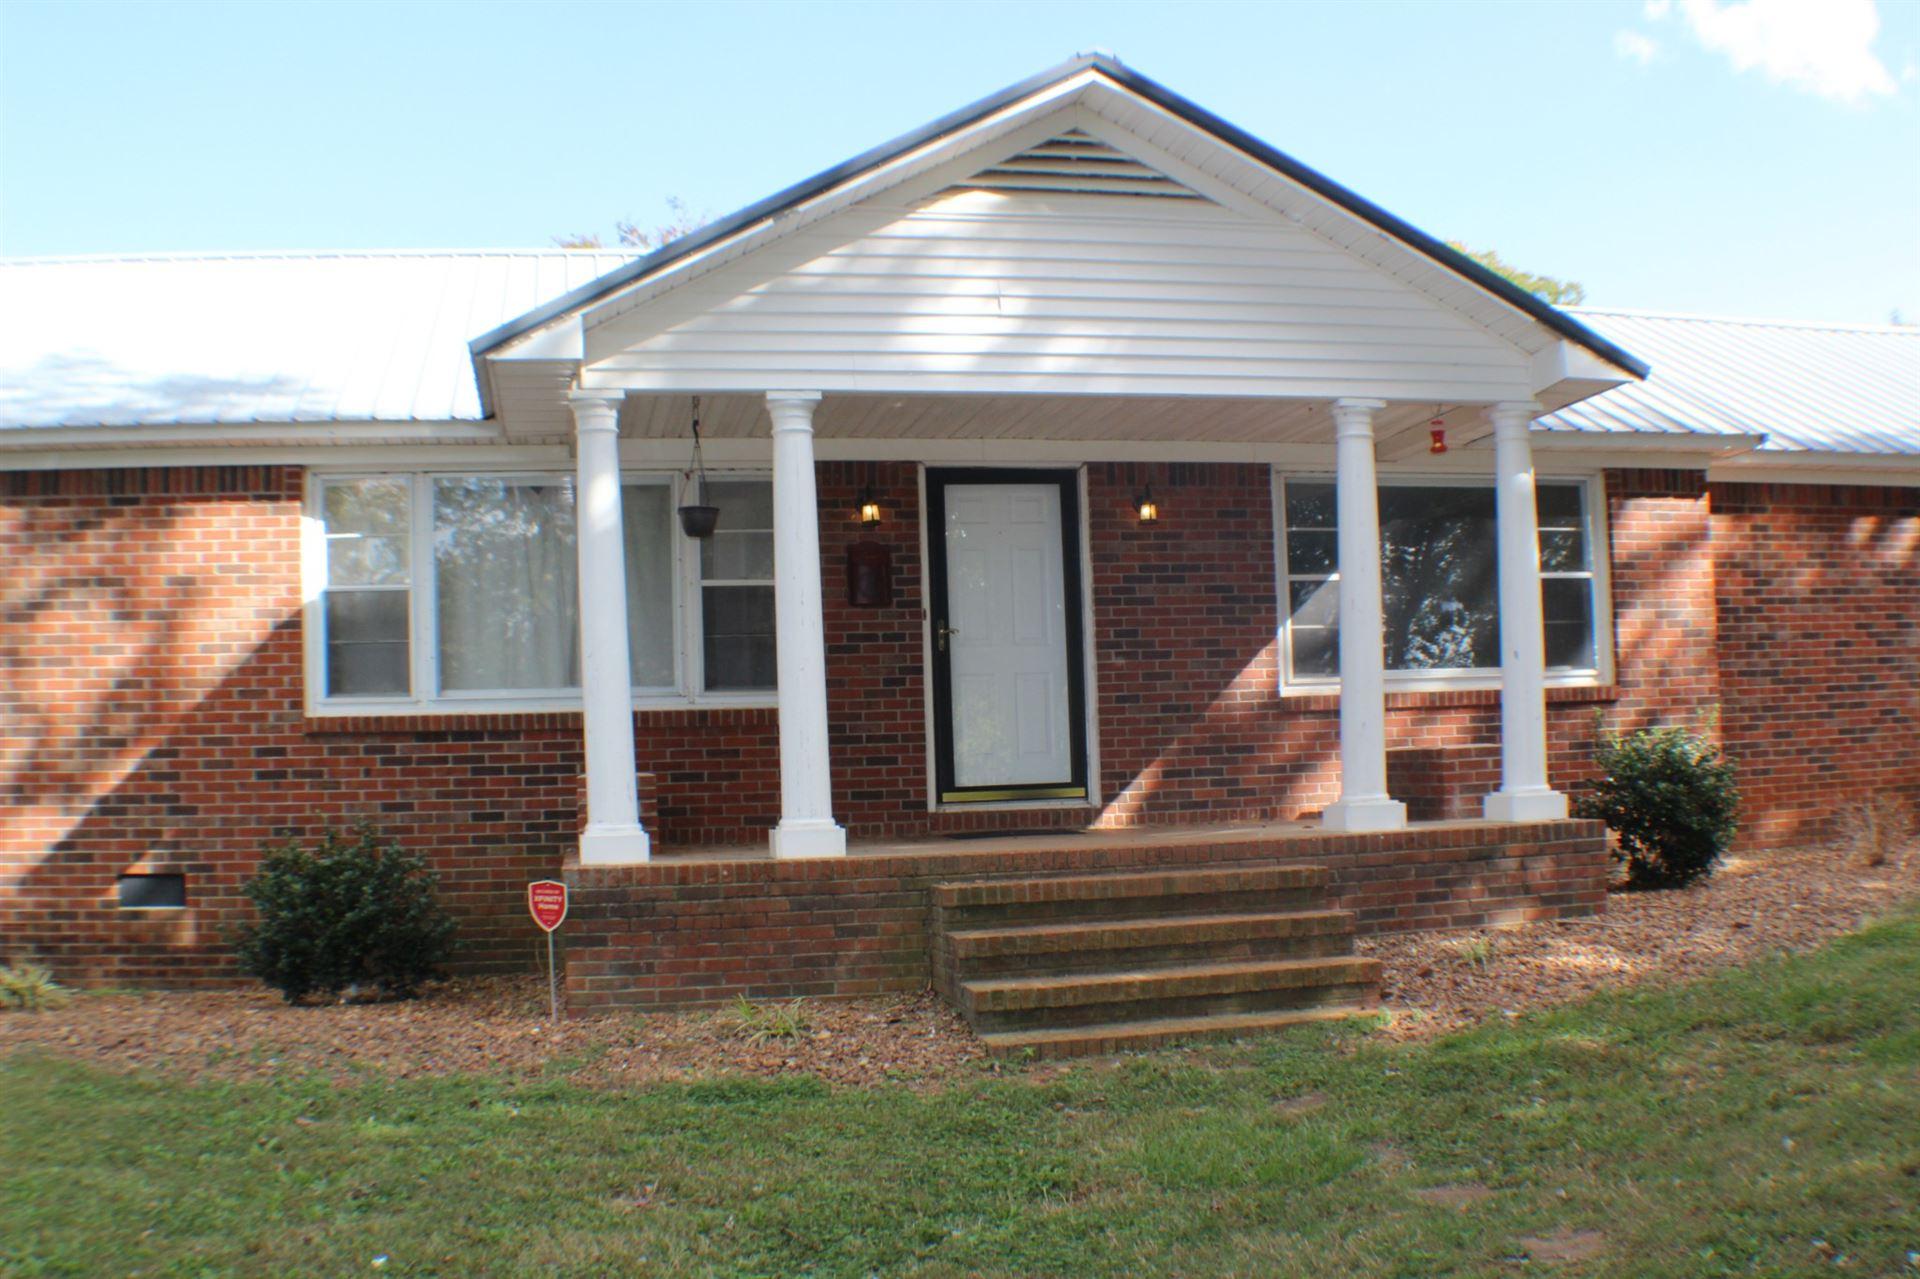 930 Georgia Crossing Rd, Winchester, TN 37398 - MLS#: 2200454